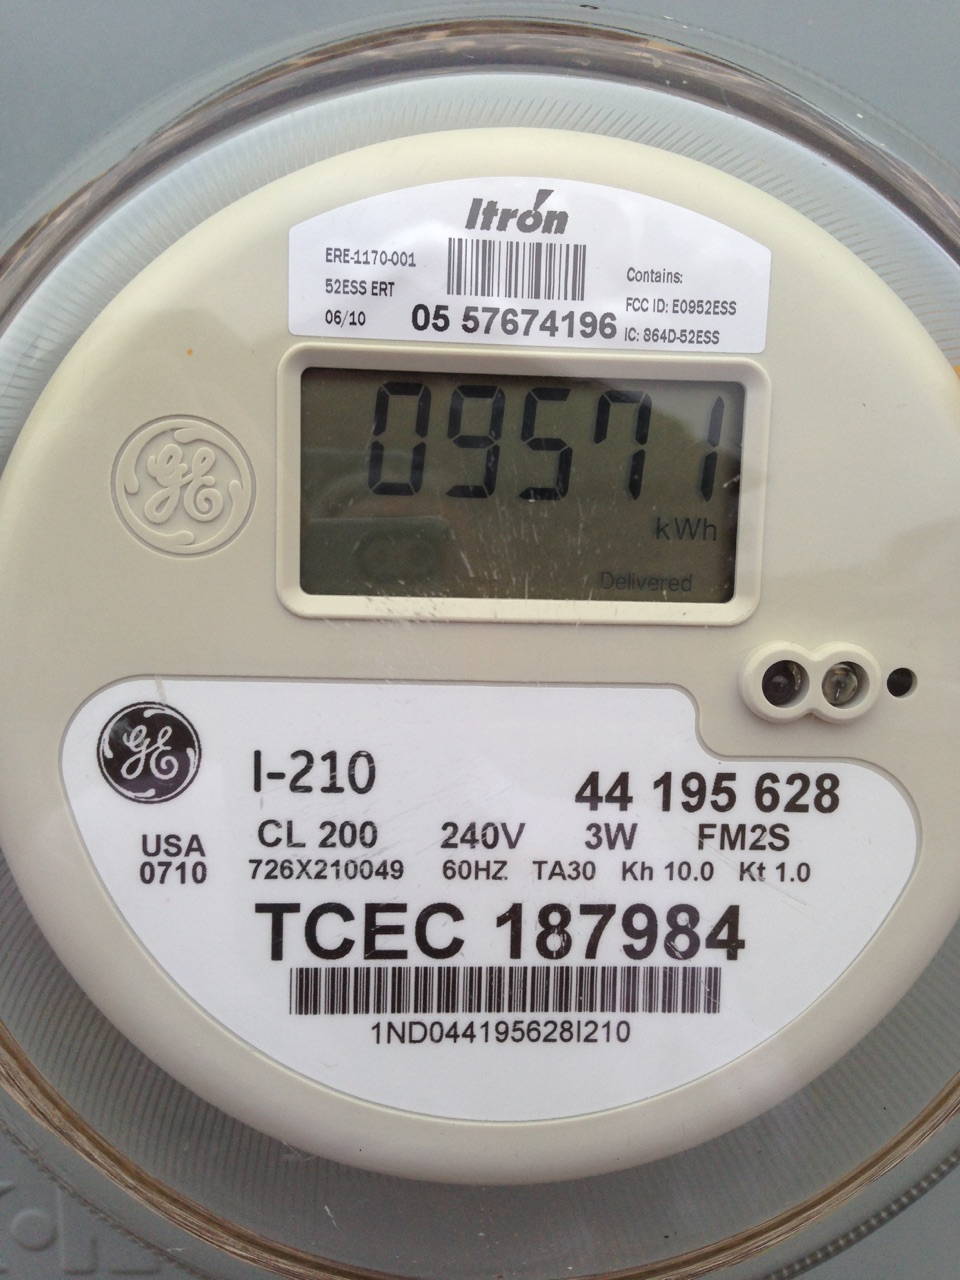 Smart Meter RF Radiation Safety